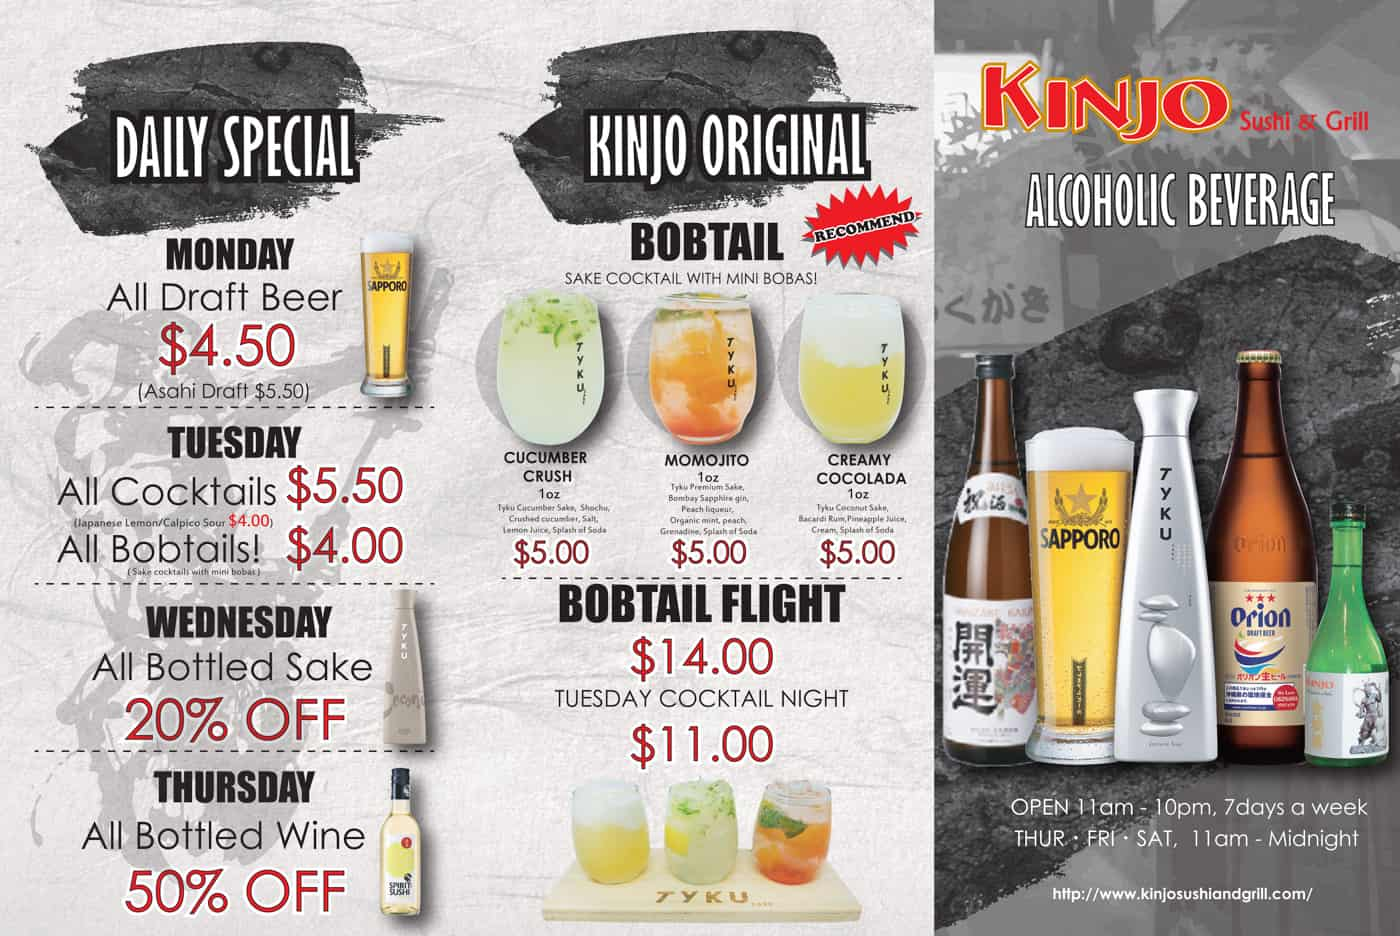 Kinjo Westhills Drink Menu 2